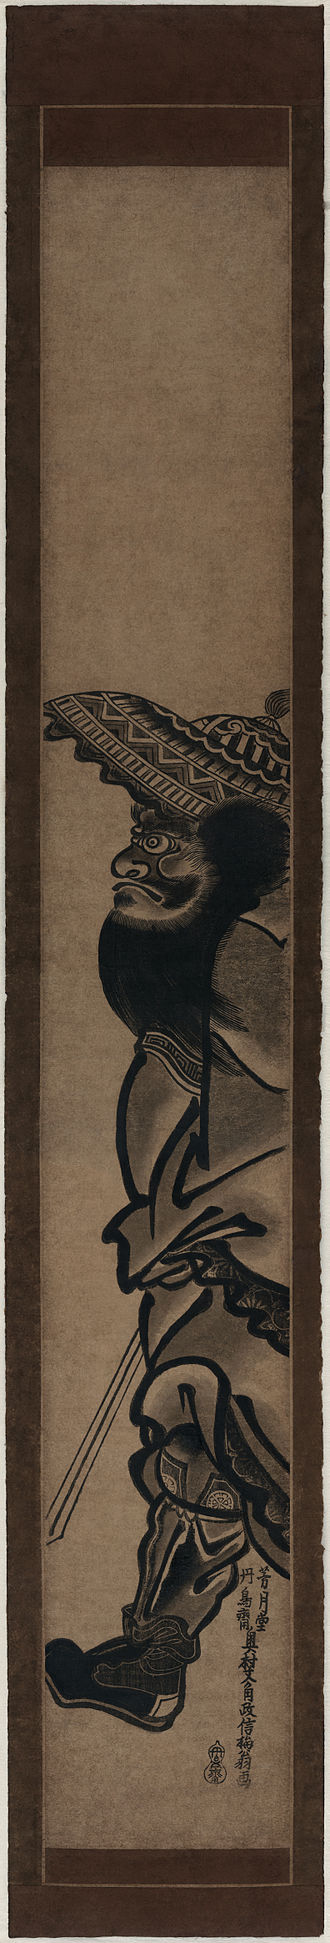 Okumura Masanobu - Image: Shoki 2